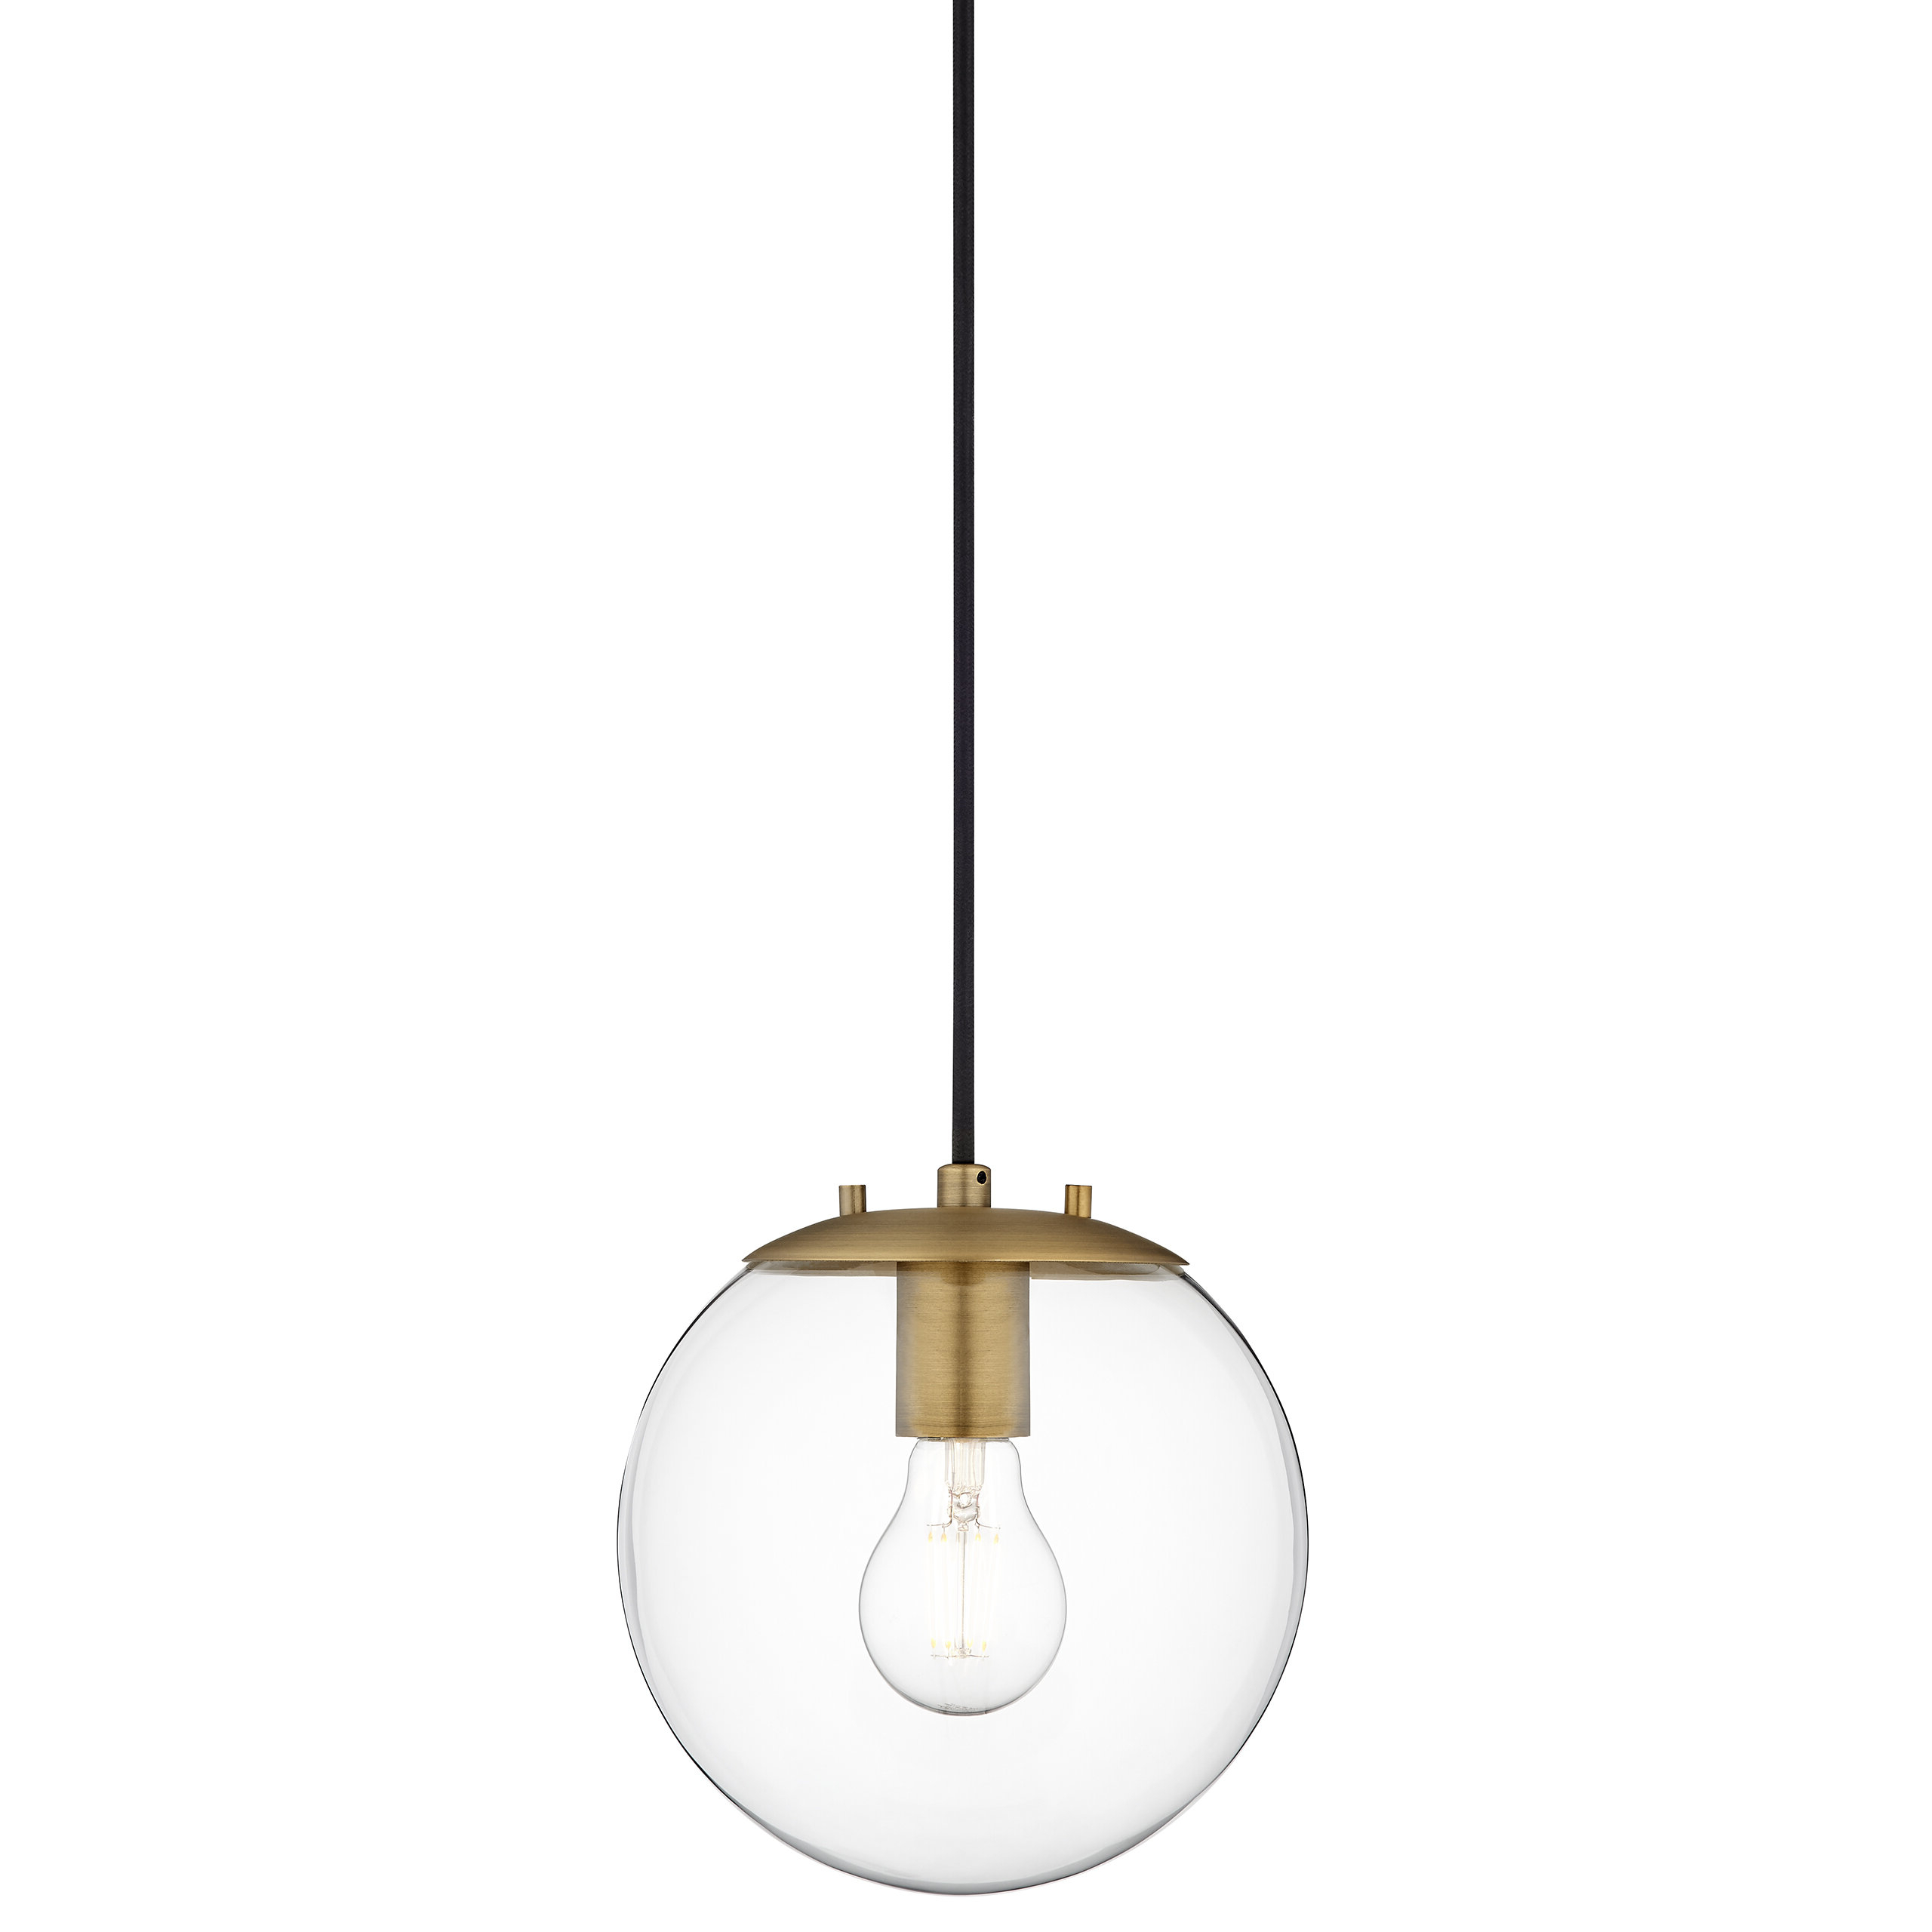 Most Recent Cayden 1 Light Single Globe Pendants Intended For Wysocki 1 Light Single Globe Pendant (View 19 of 25)